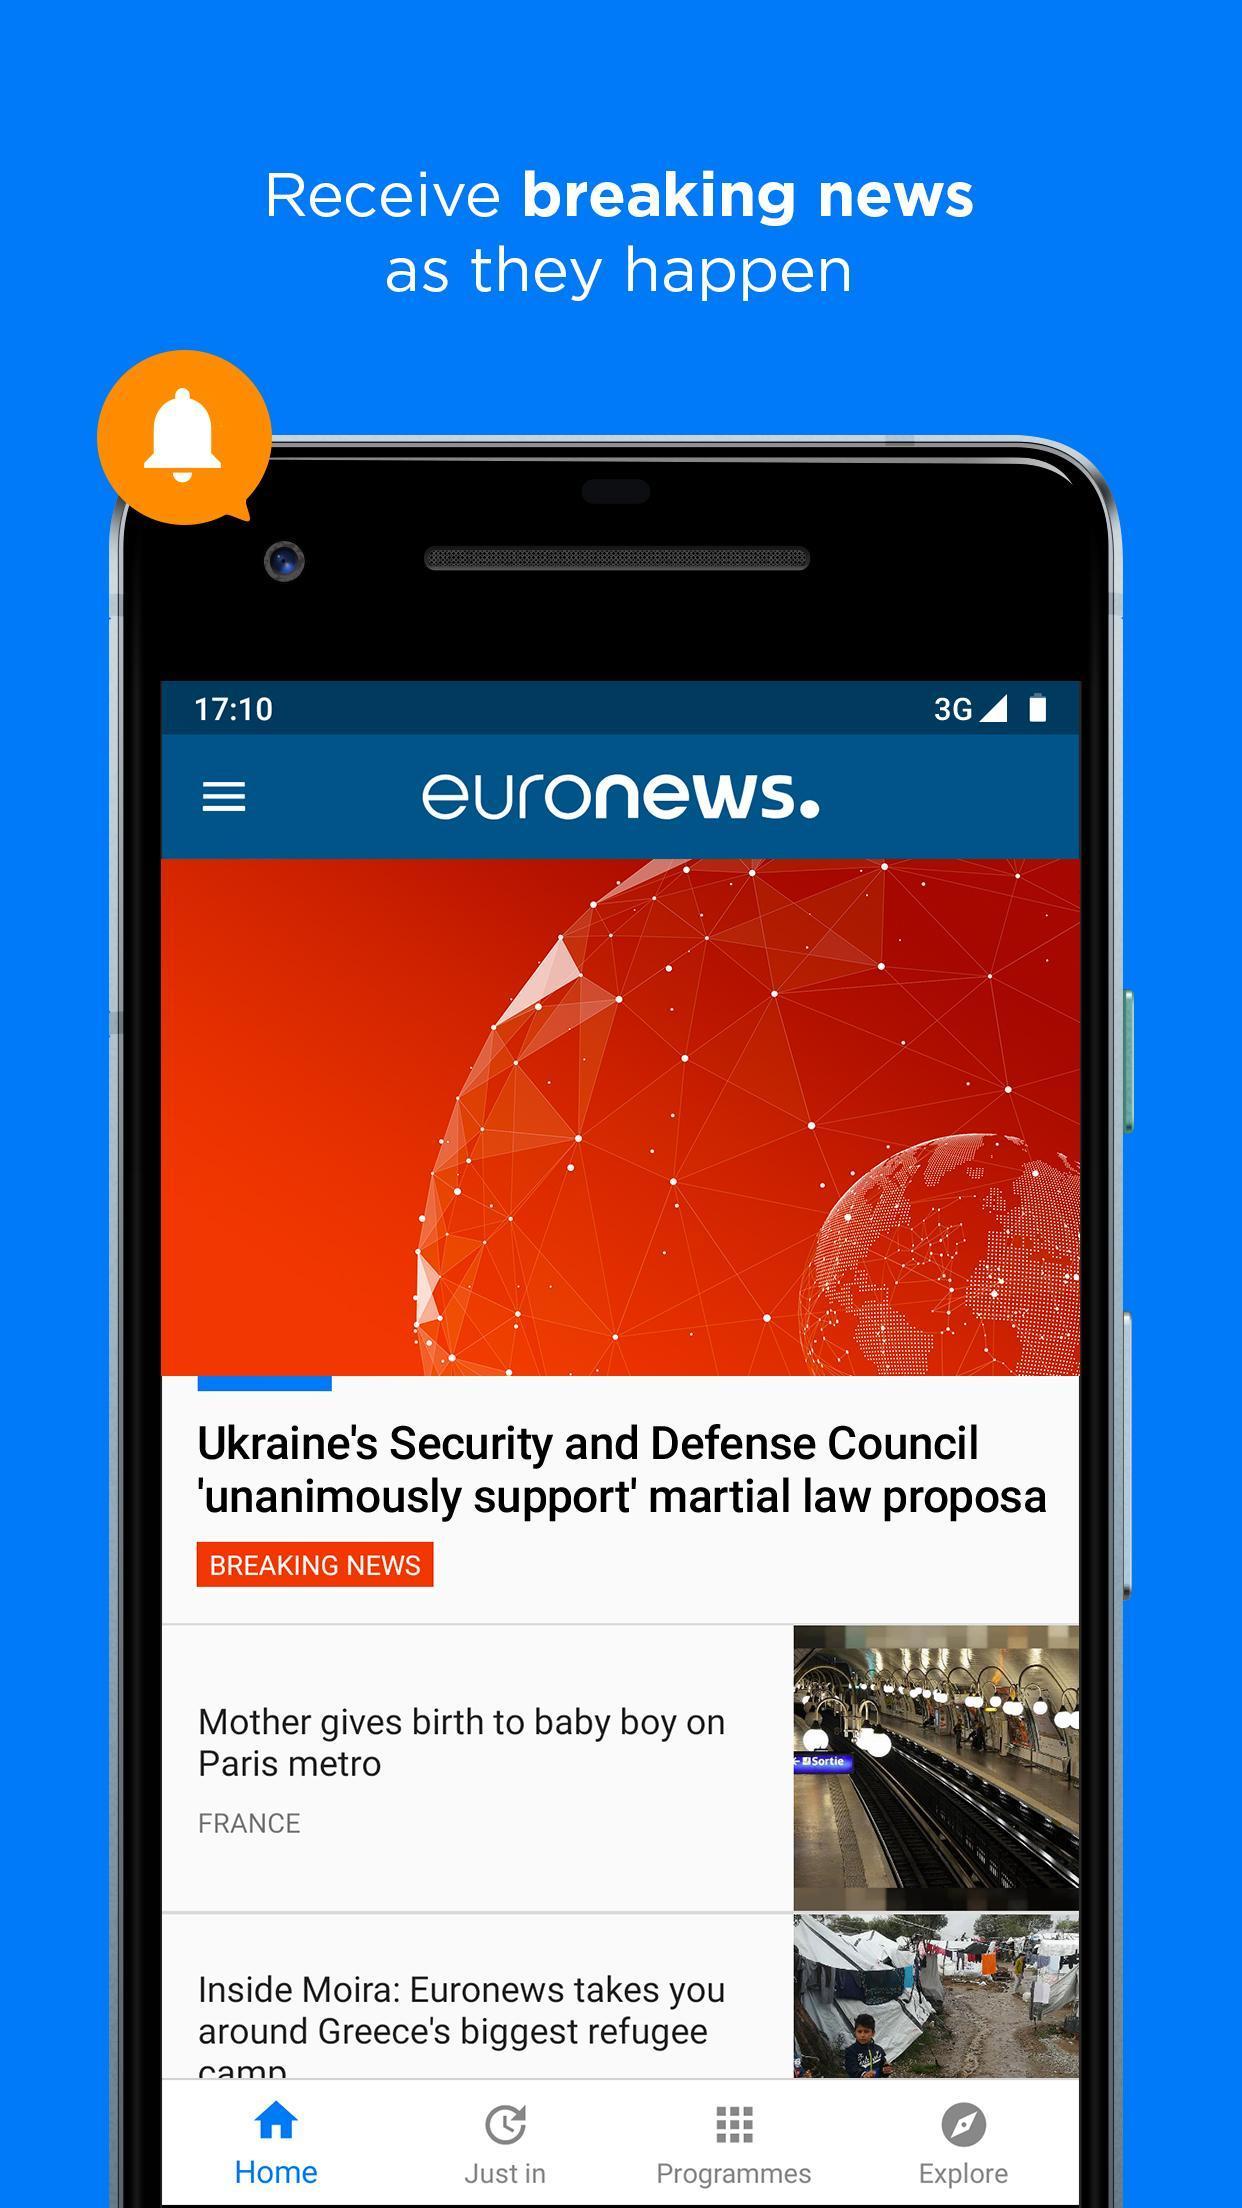 Euronews Daily breaking world news & Live TV 5.2.1 Screenshot 5